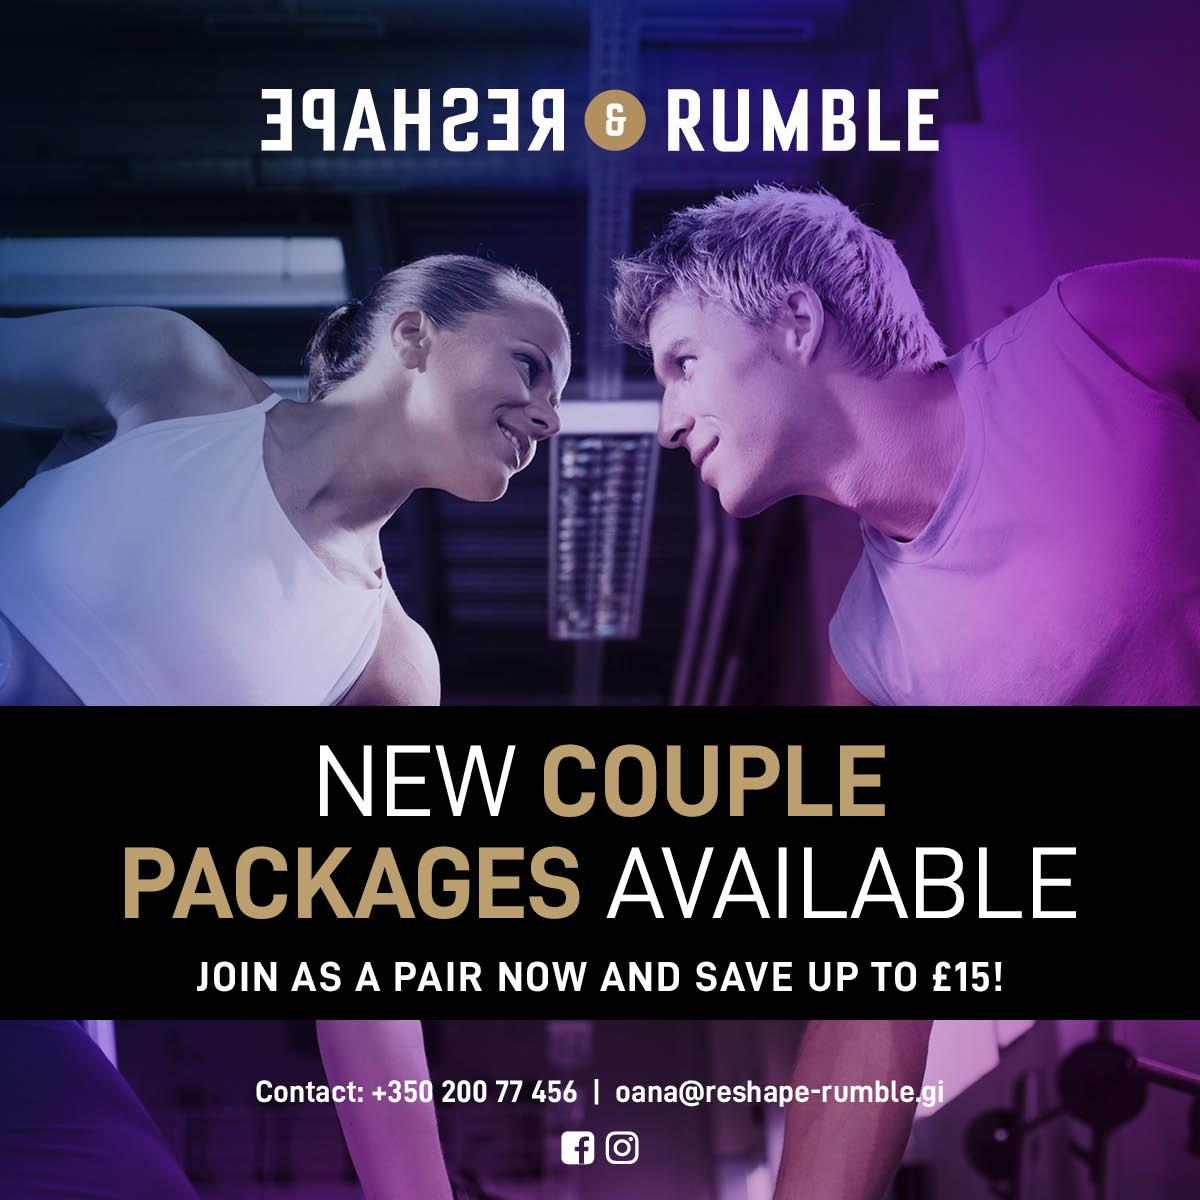 R&R_Couples_INSTA.jpg